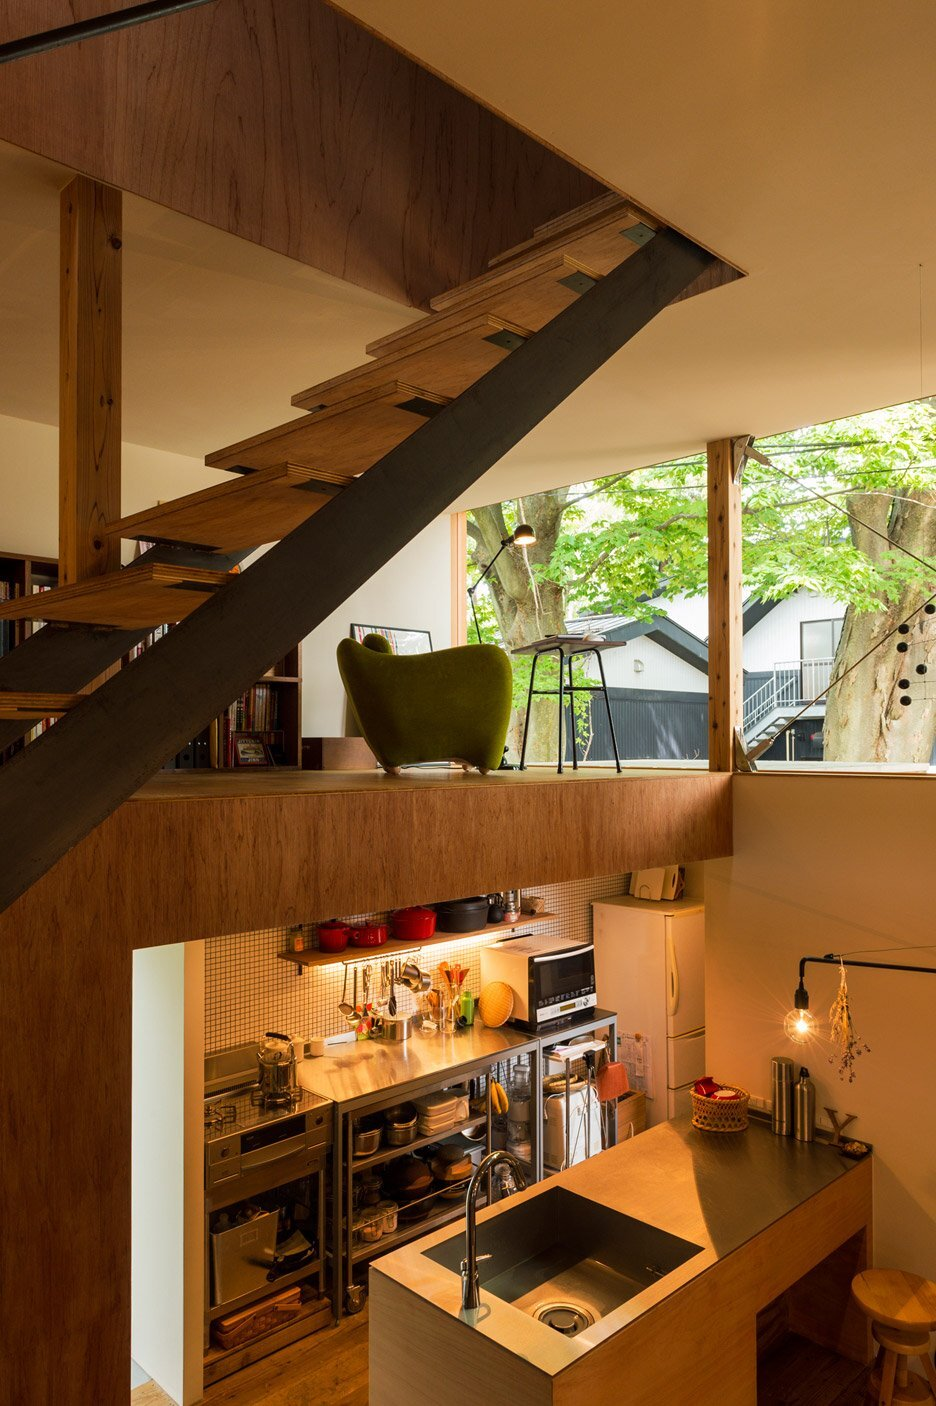 House to Catch a Tree - Takeru Shoji Architects - Japan - Kitchen - Humble Homes